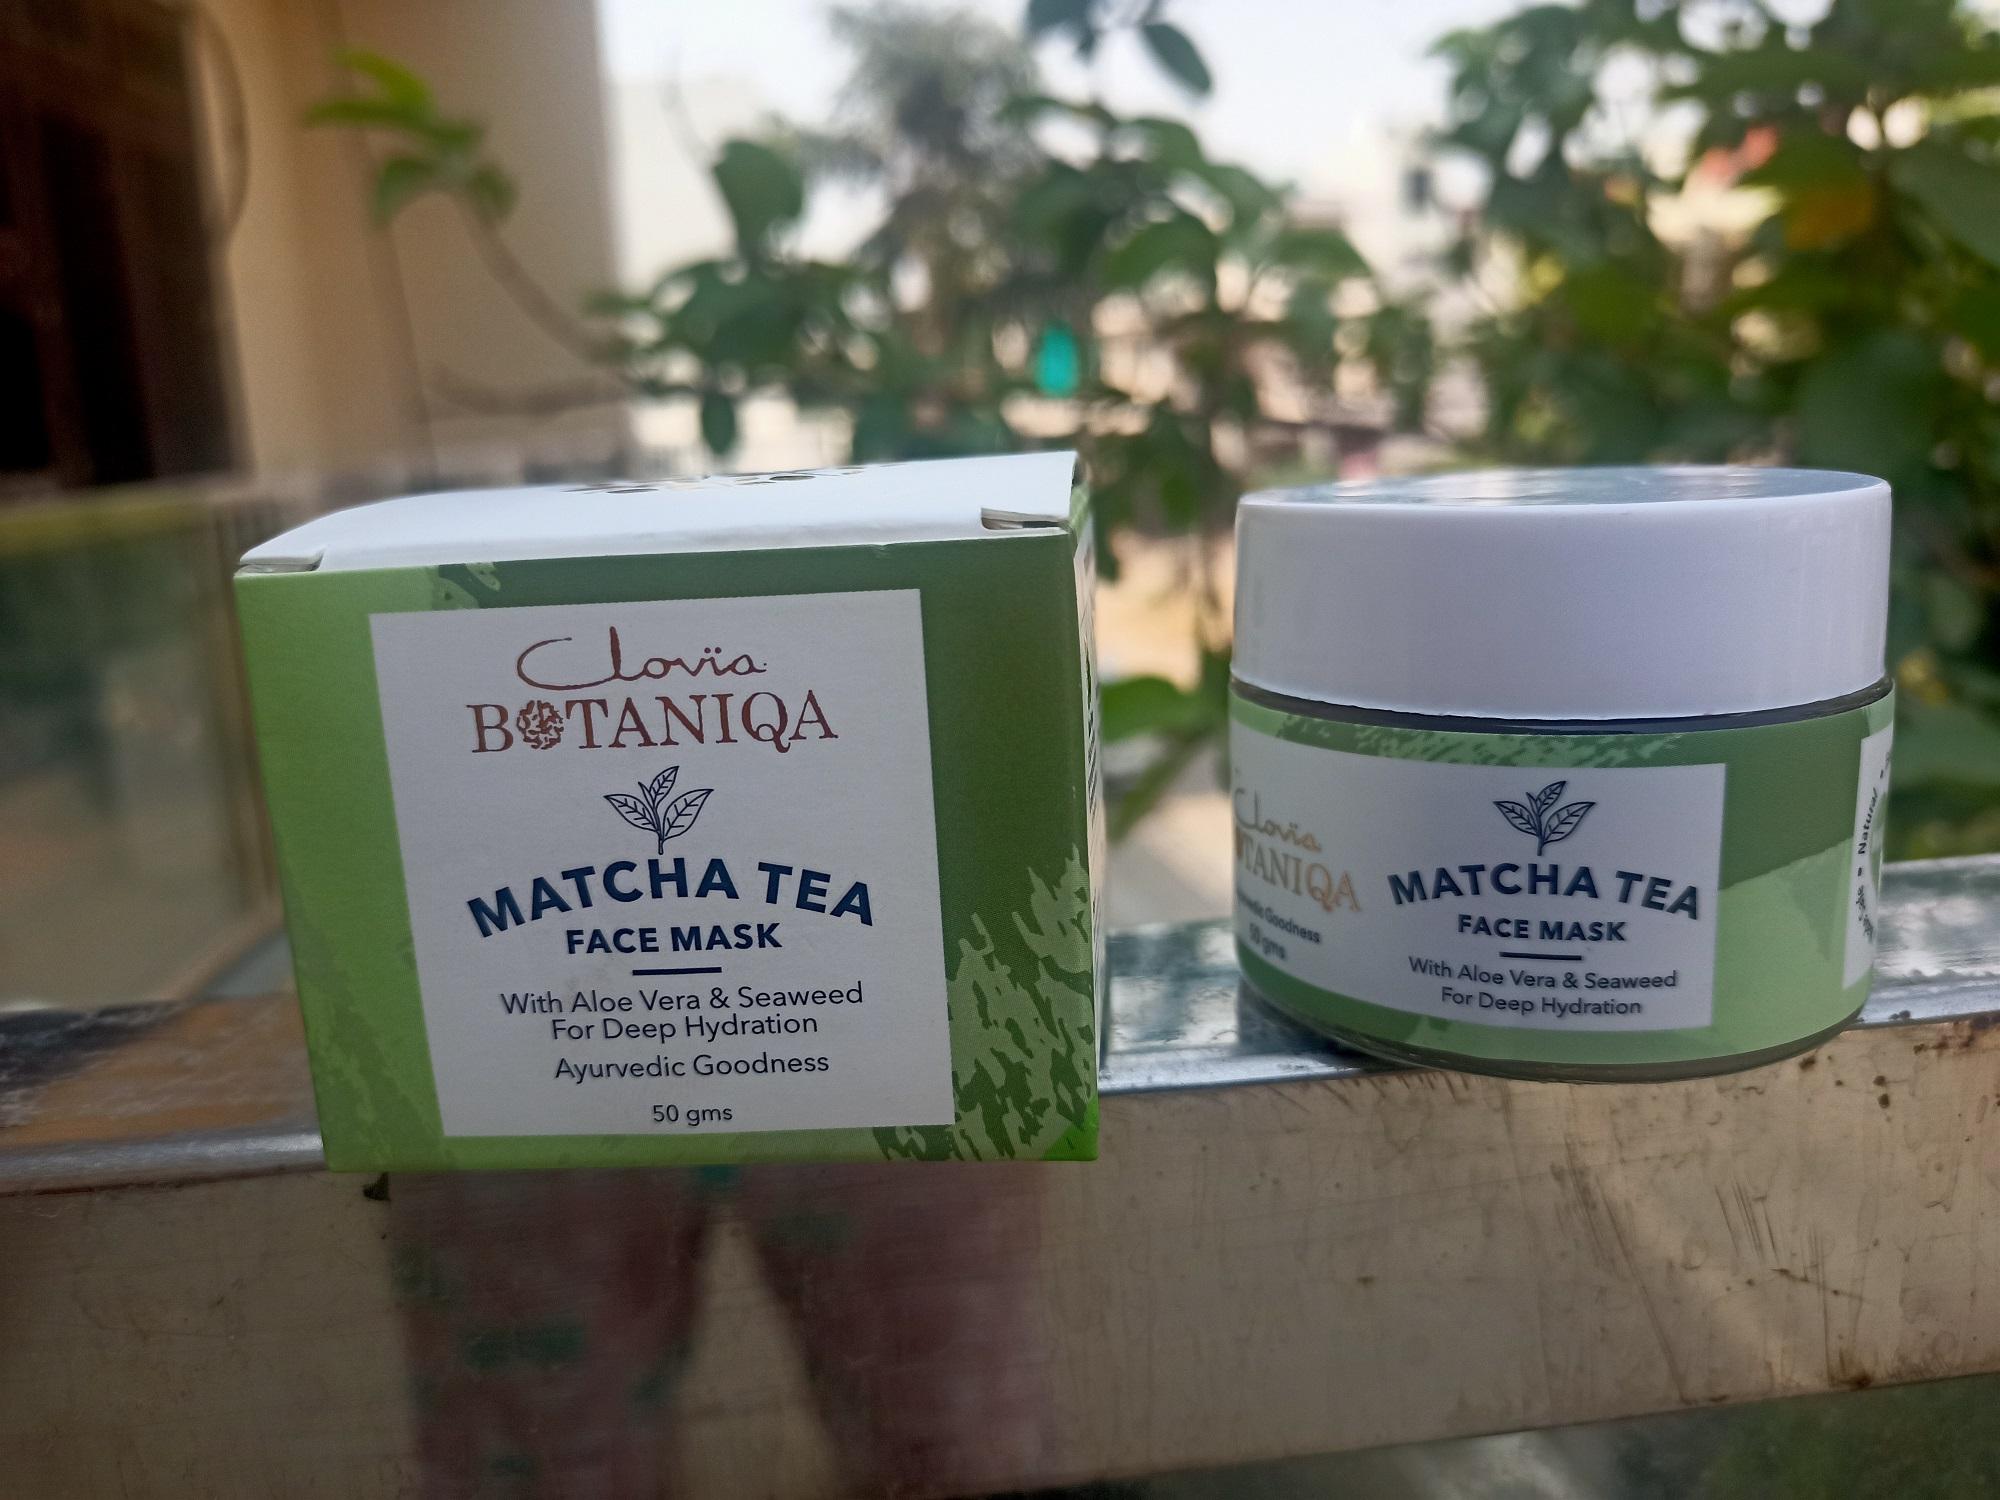 Clovia Botaniqa Matcha Tea Mask